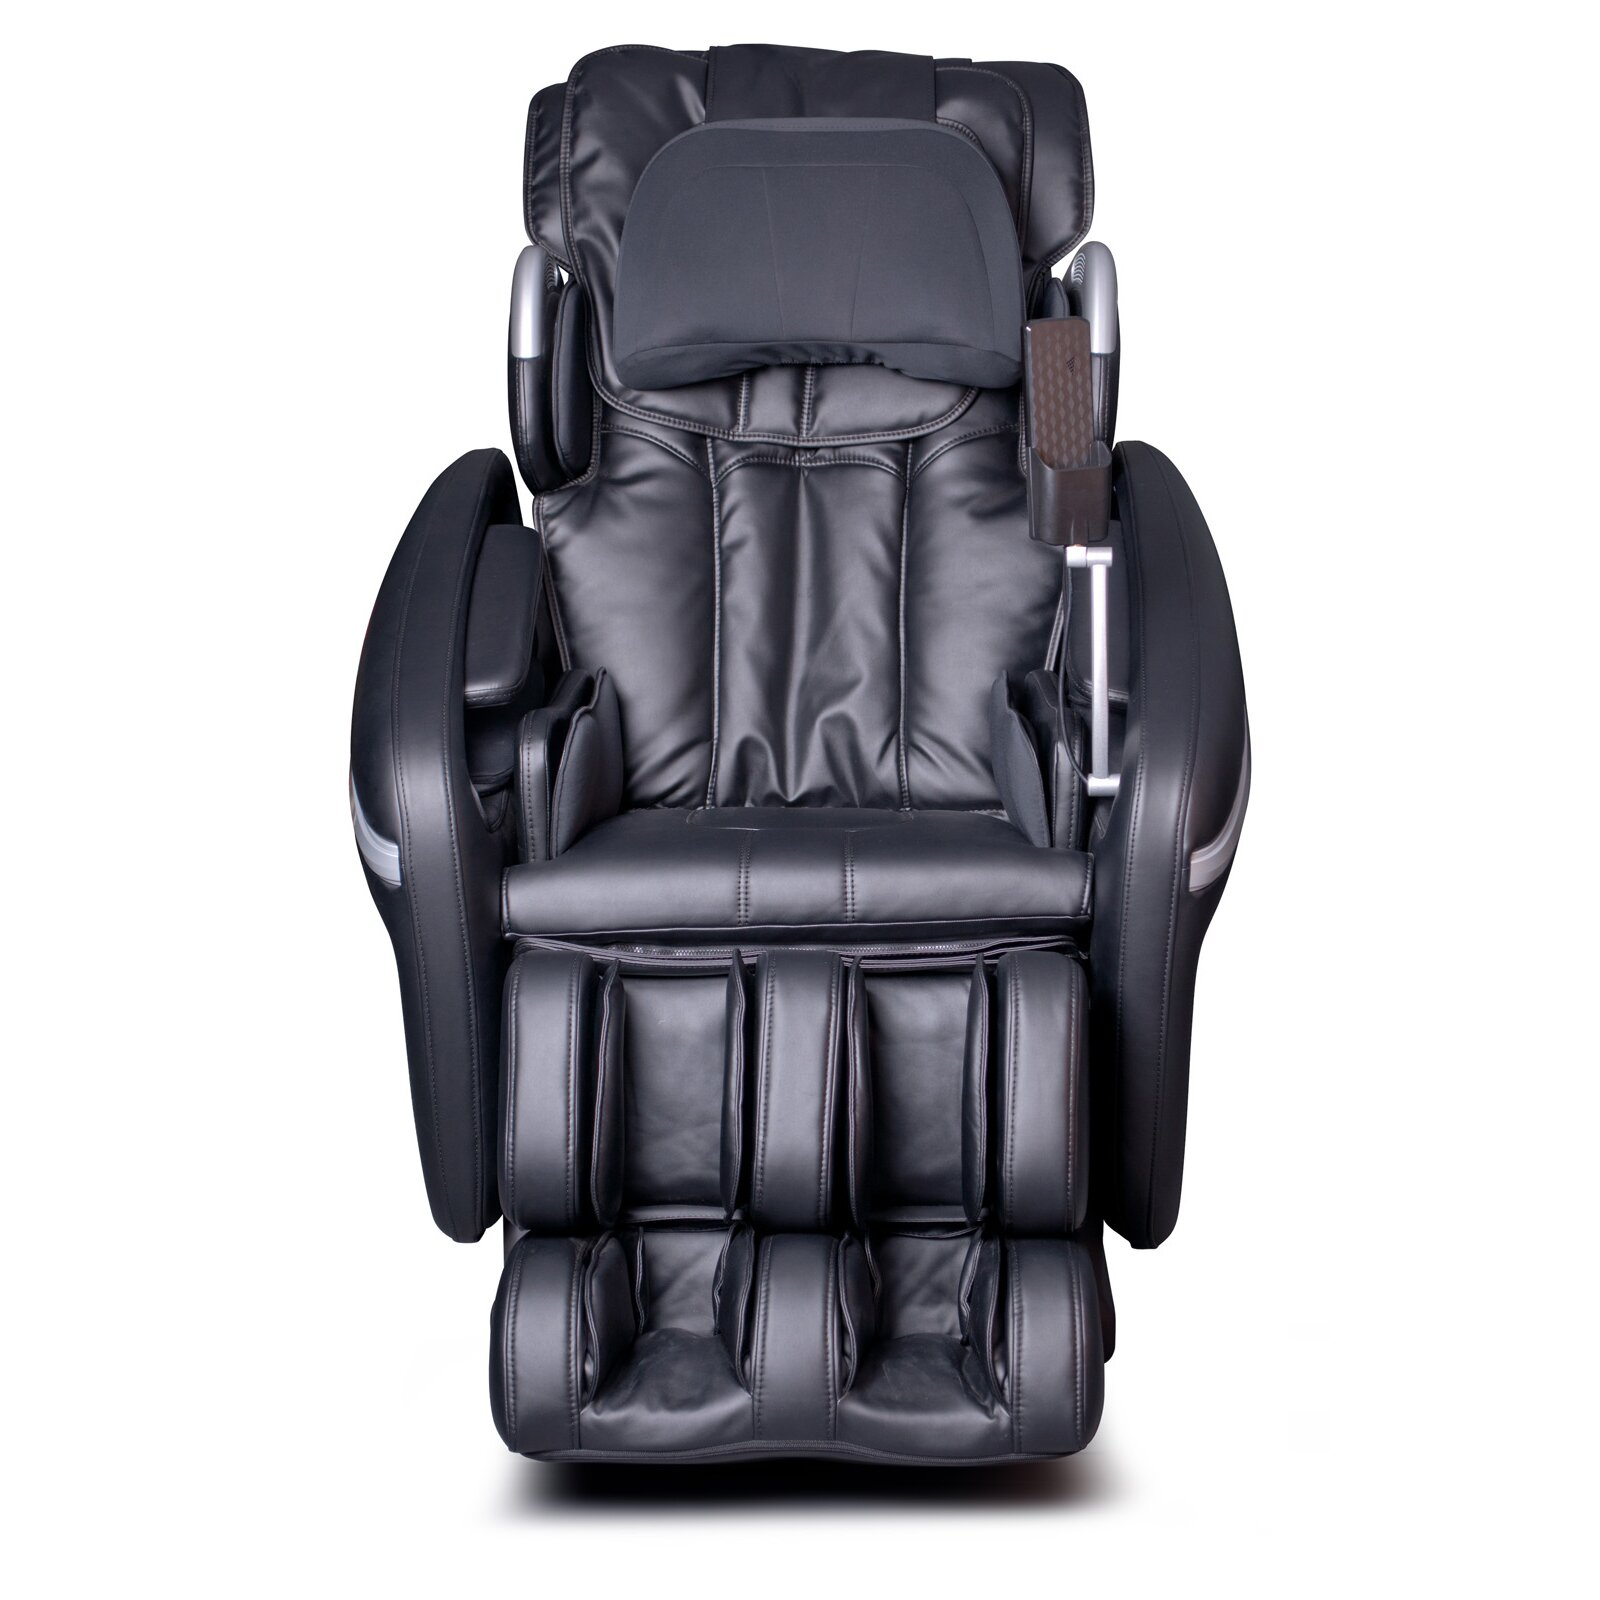 Osaki OS 7200 H Heated Reclining Massage Chair & Reviews